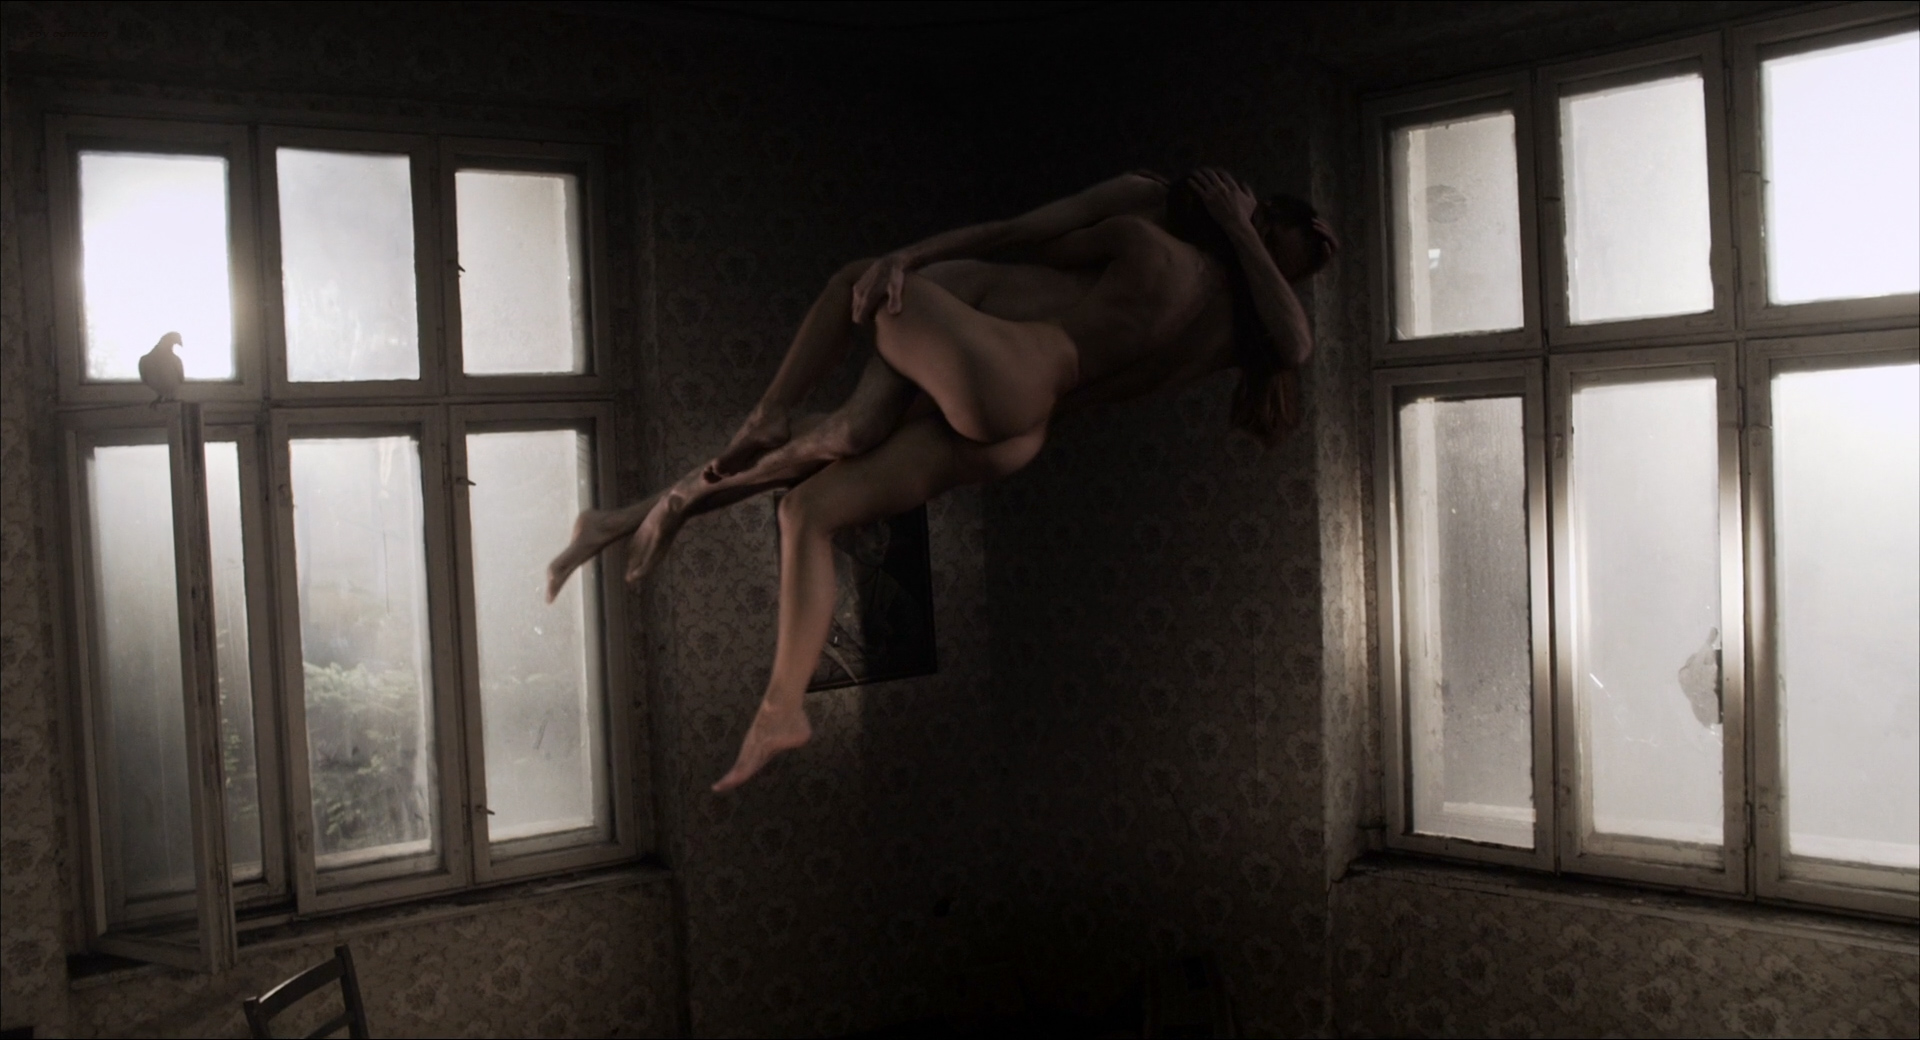 Ewa Matula nude busty boobs Karolina Korta hot others nude butt - Onirica (PL-2014) HD 1080p BluRay (11)